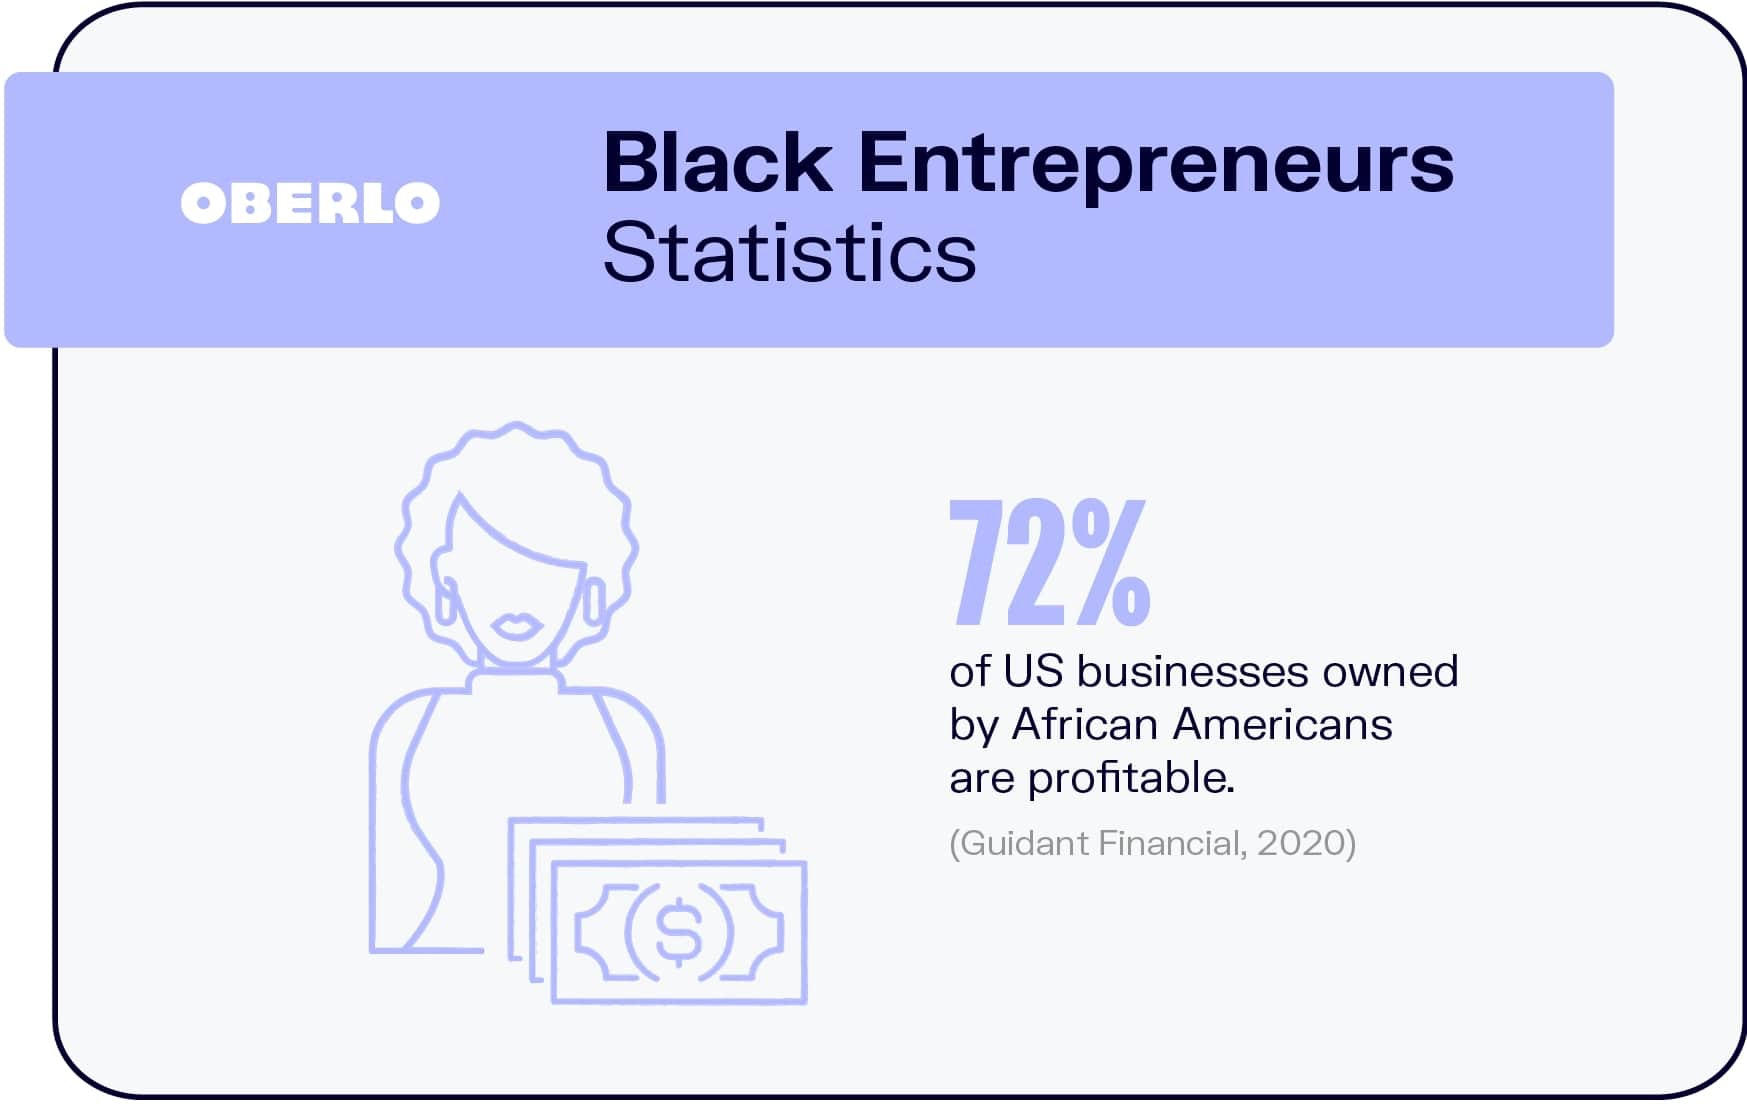 Black Entrepreneurs Statistics